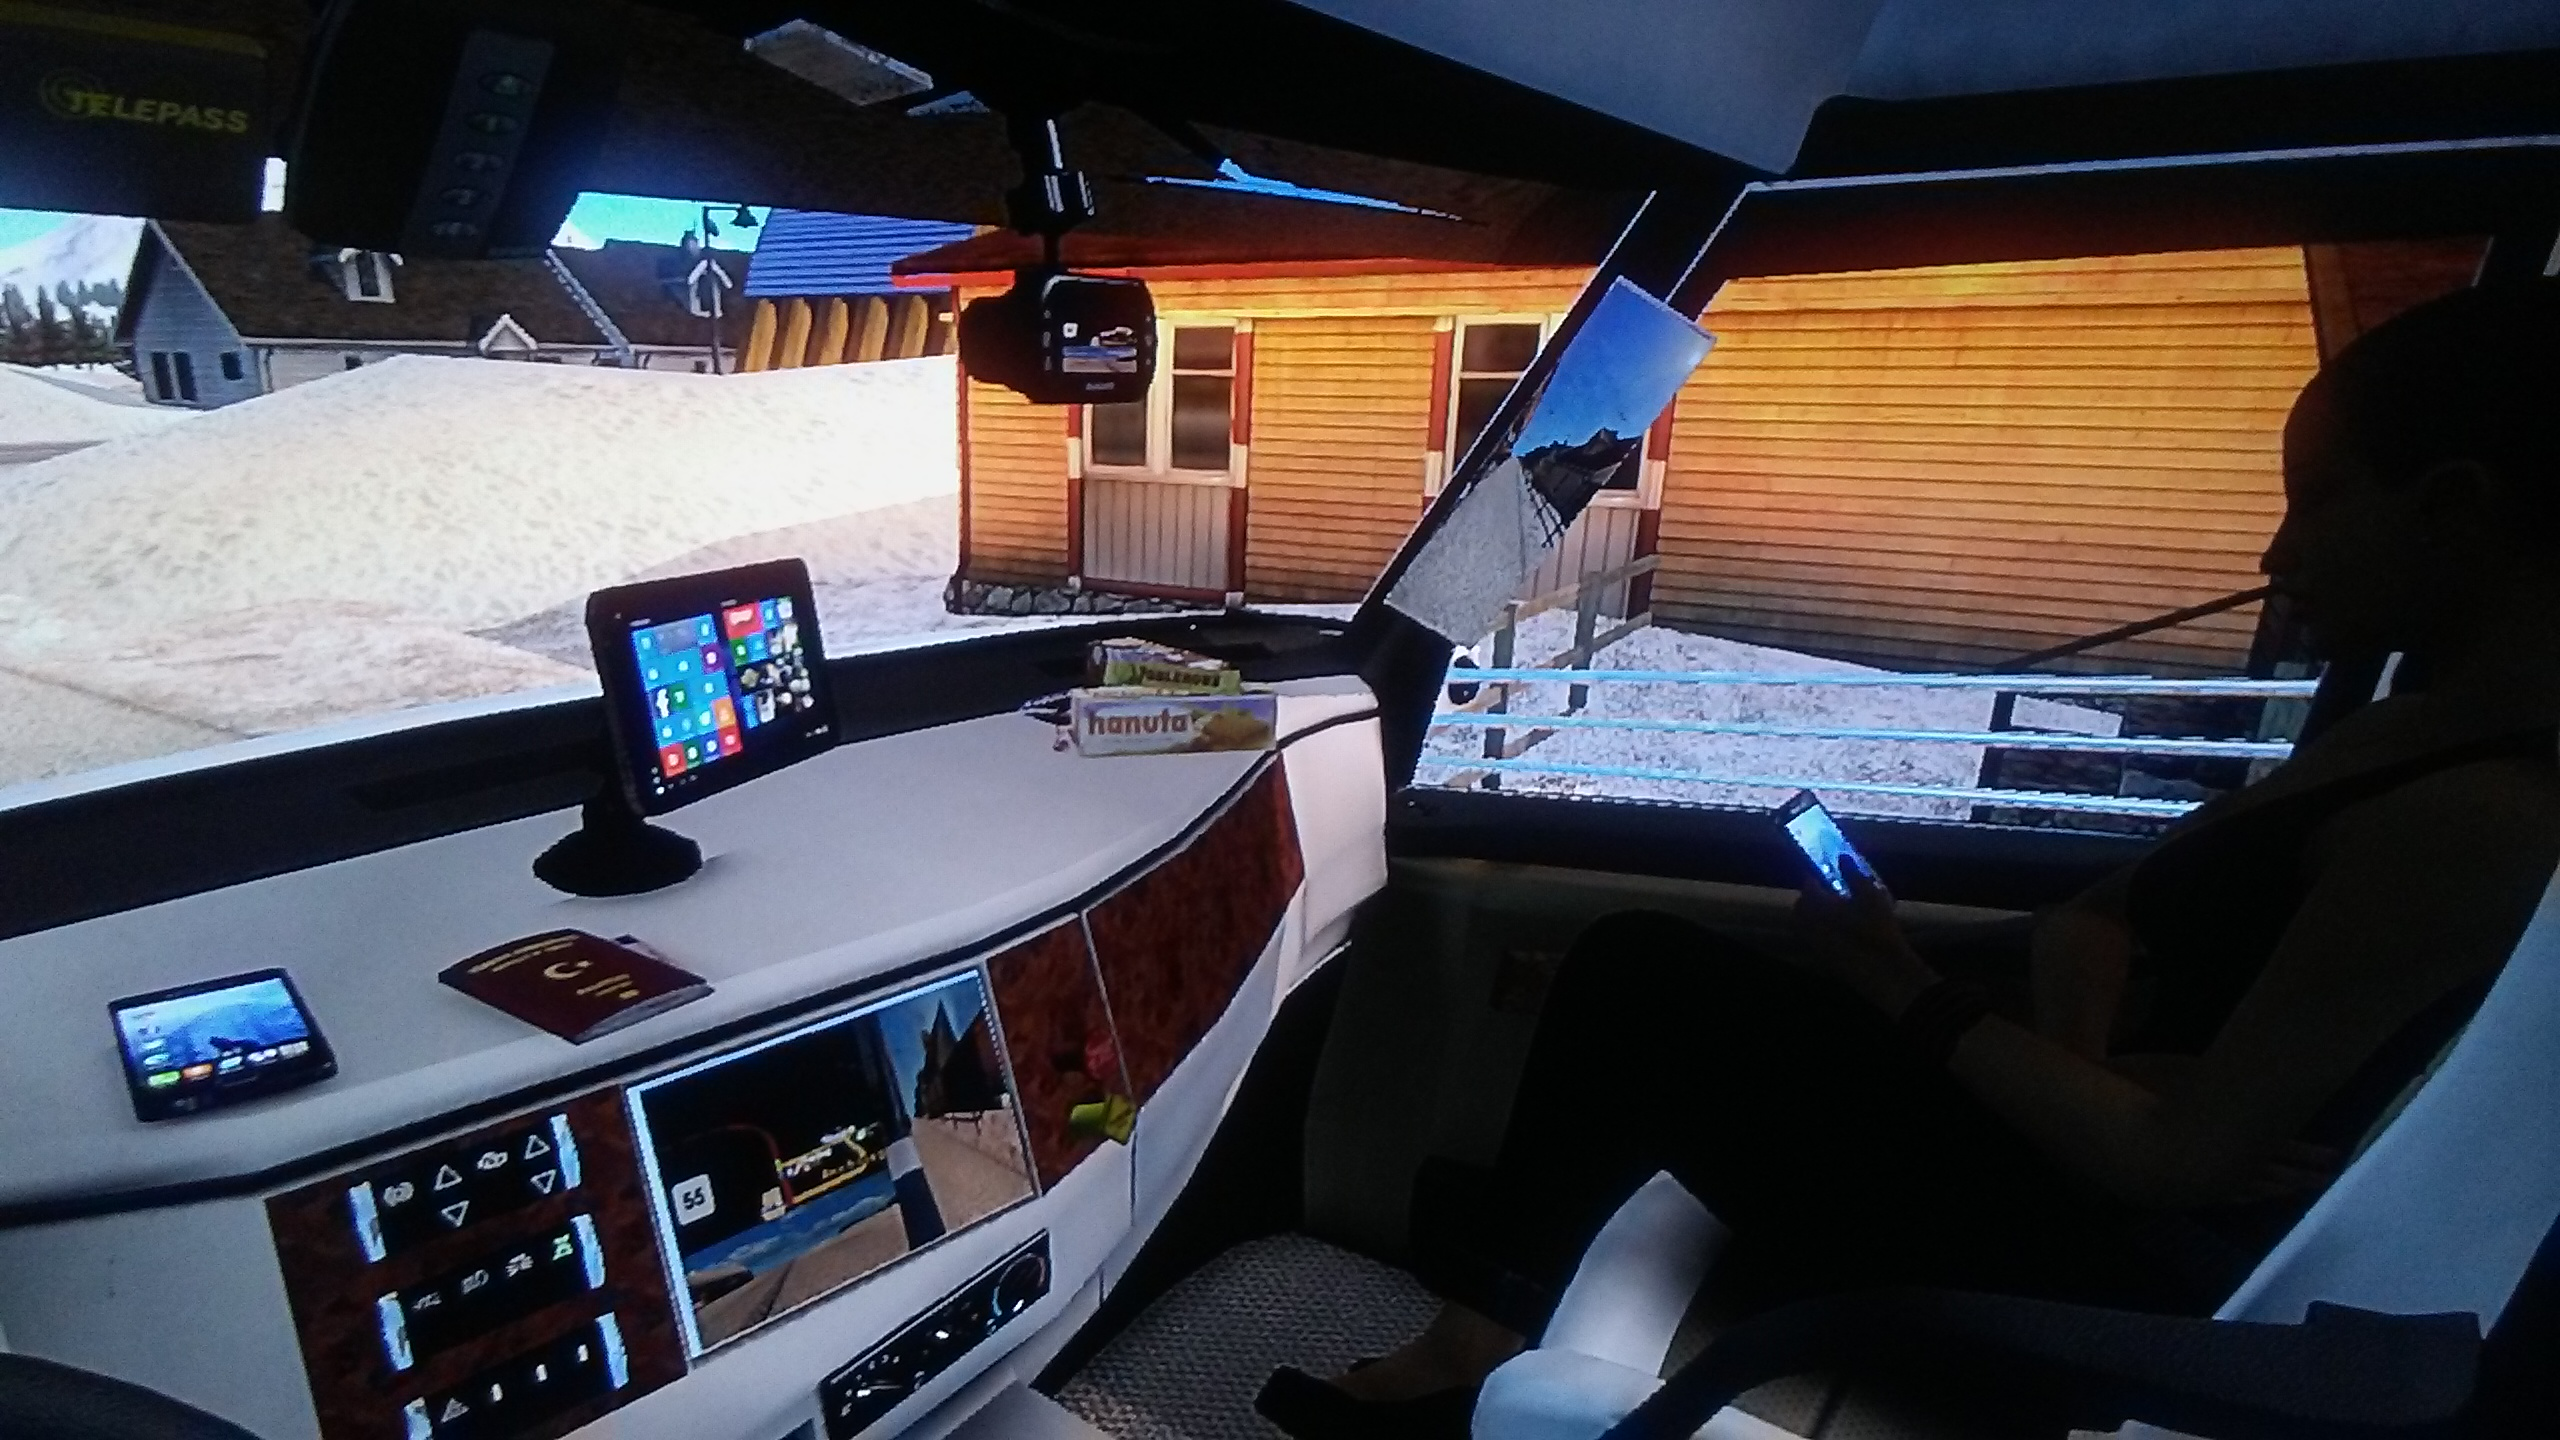 Concept truck 2020 ATS... Futuristic Bus